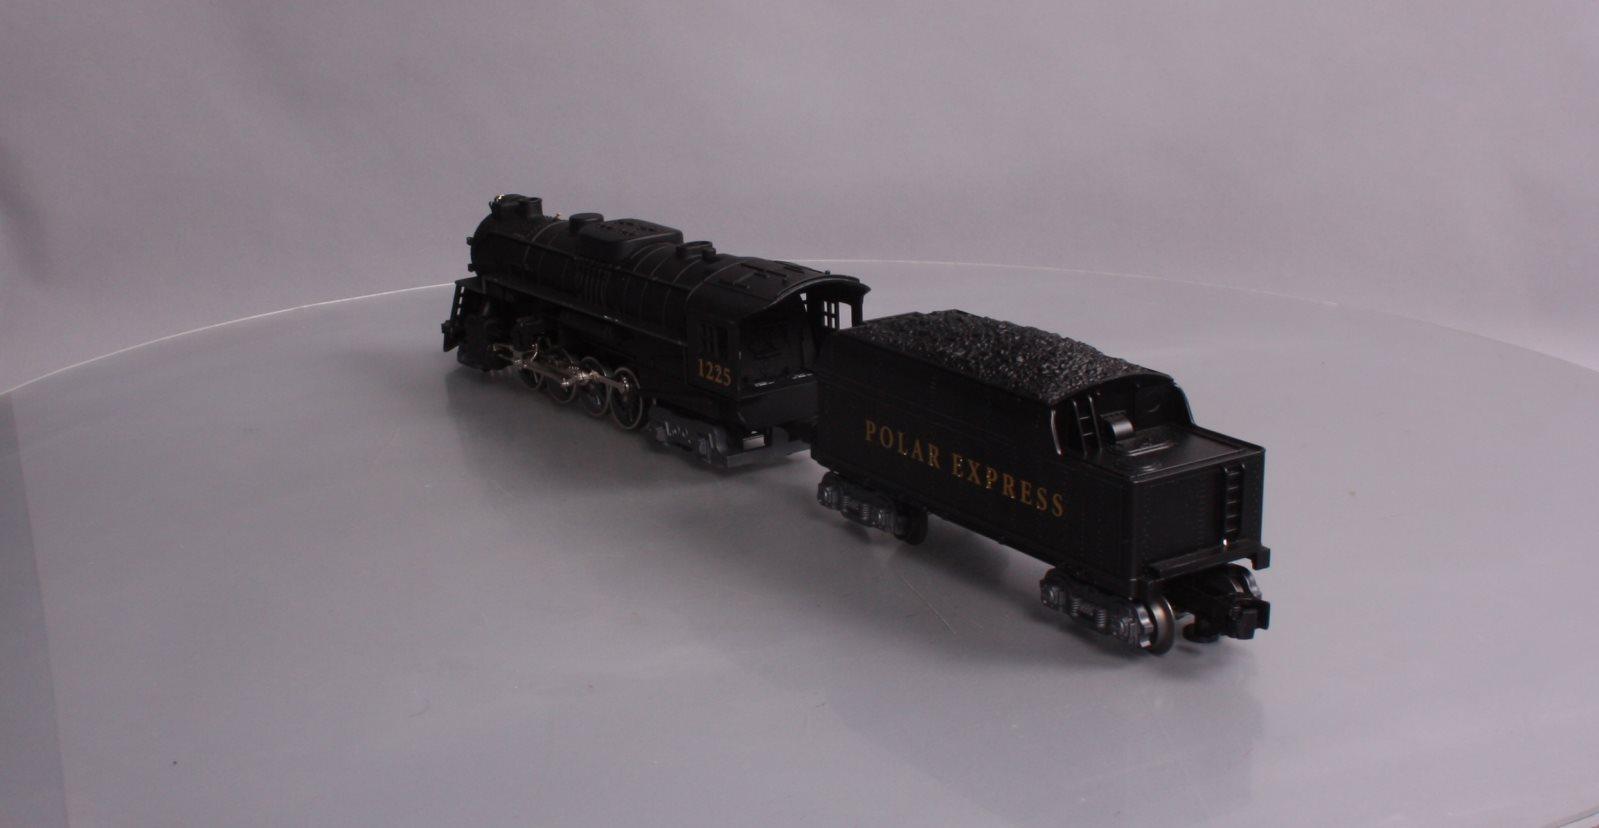 Lionel 6-84328 O The Polar Express Locomotive w/ Tender #1225 | eBay